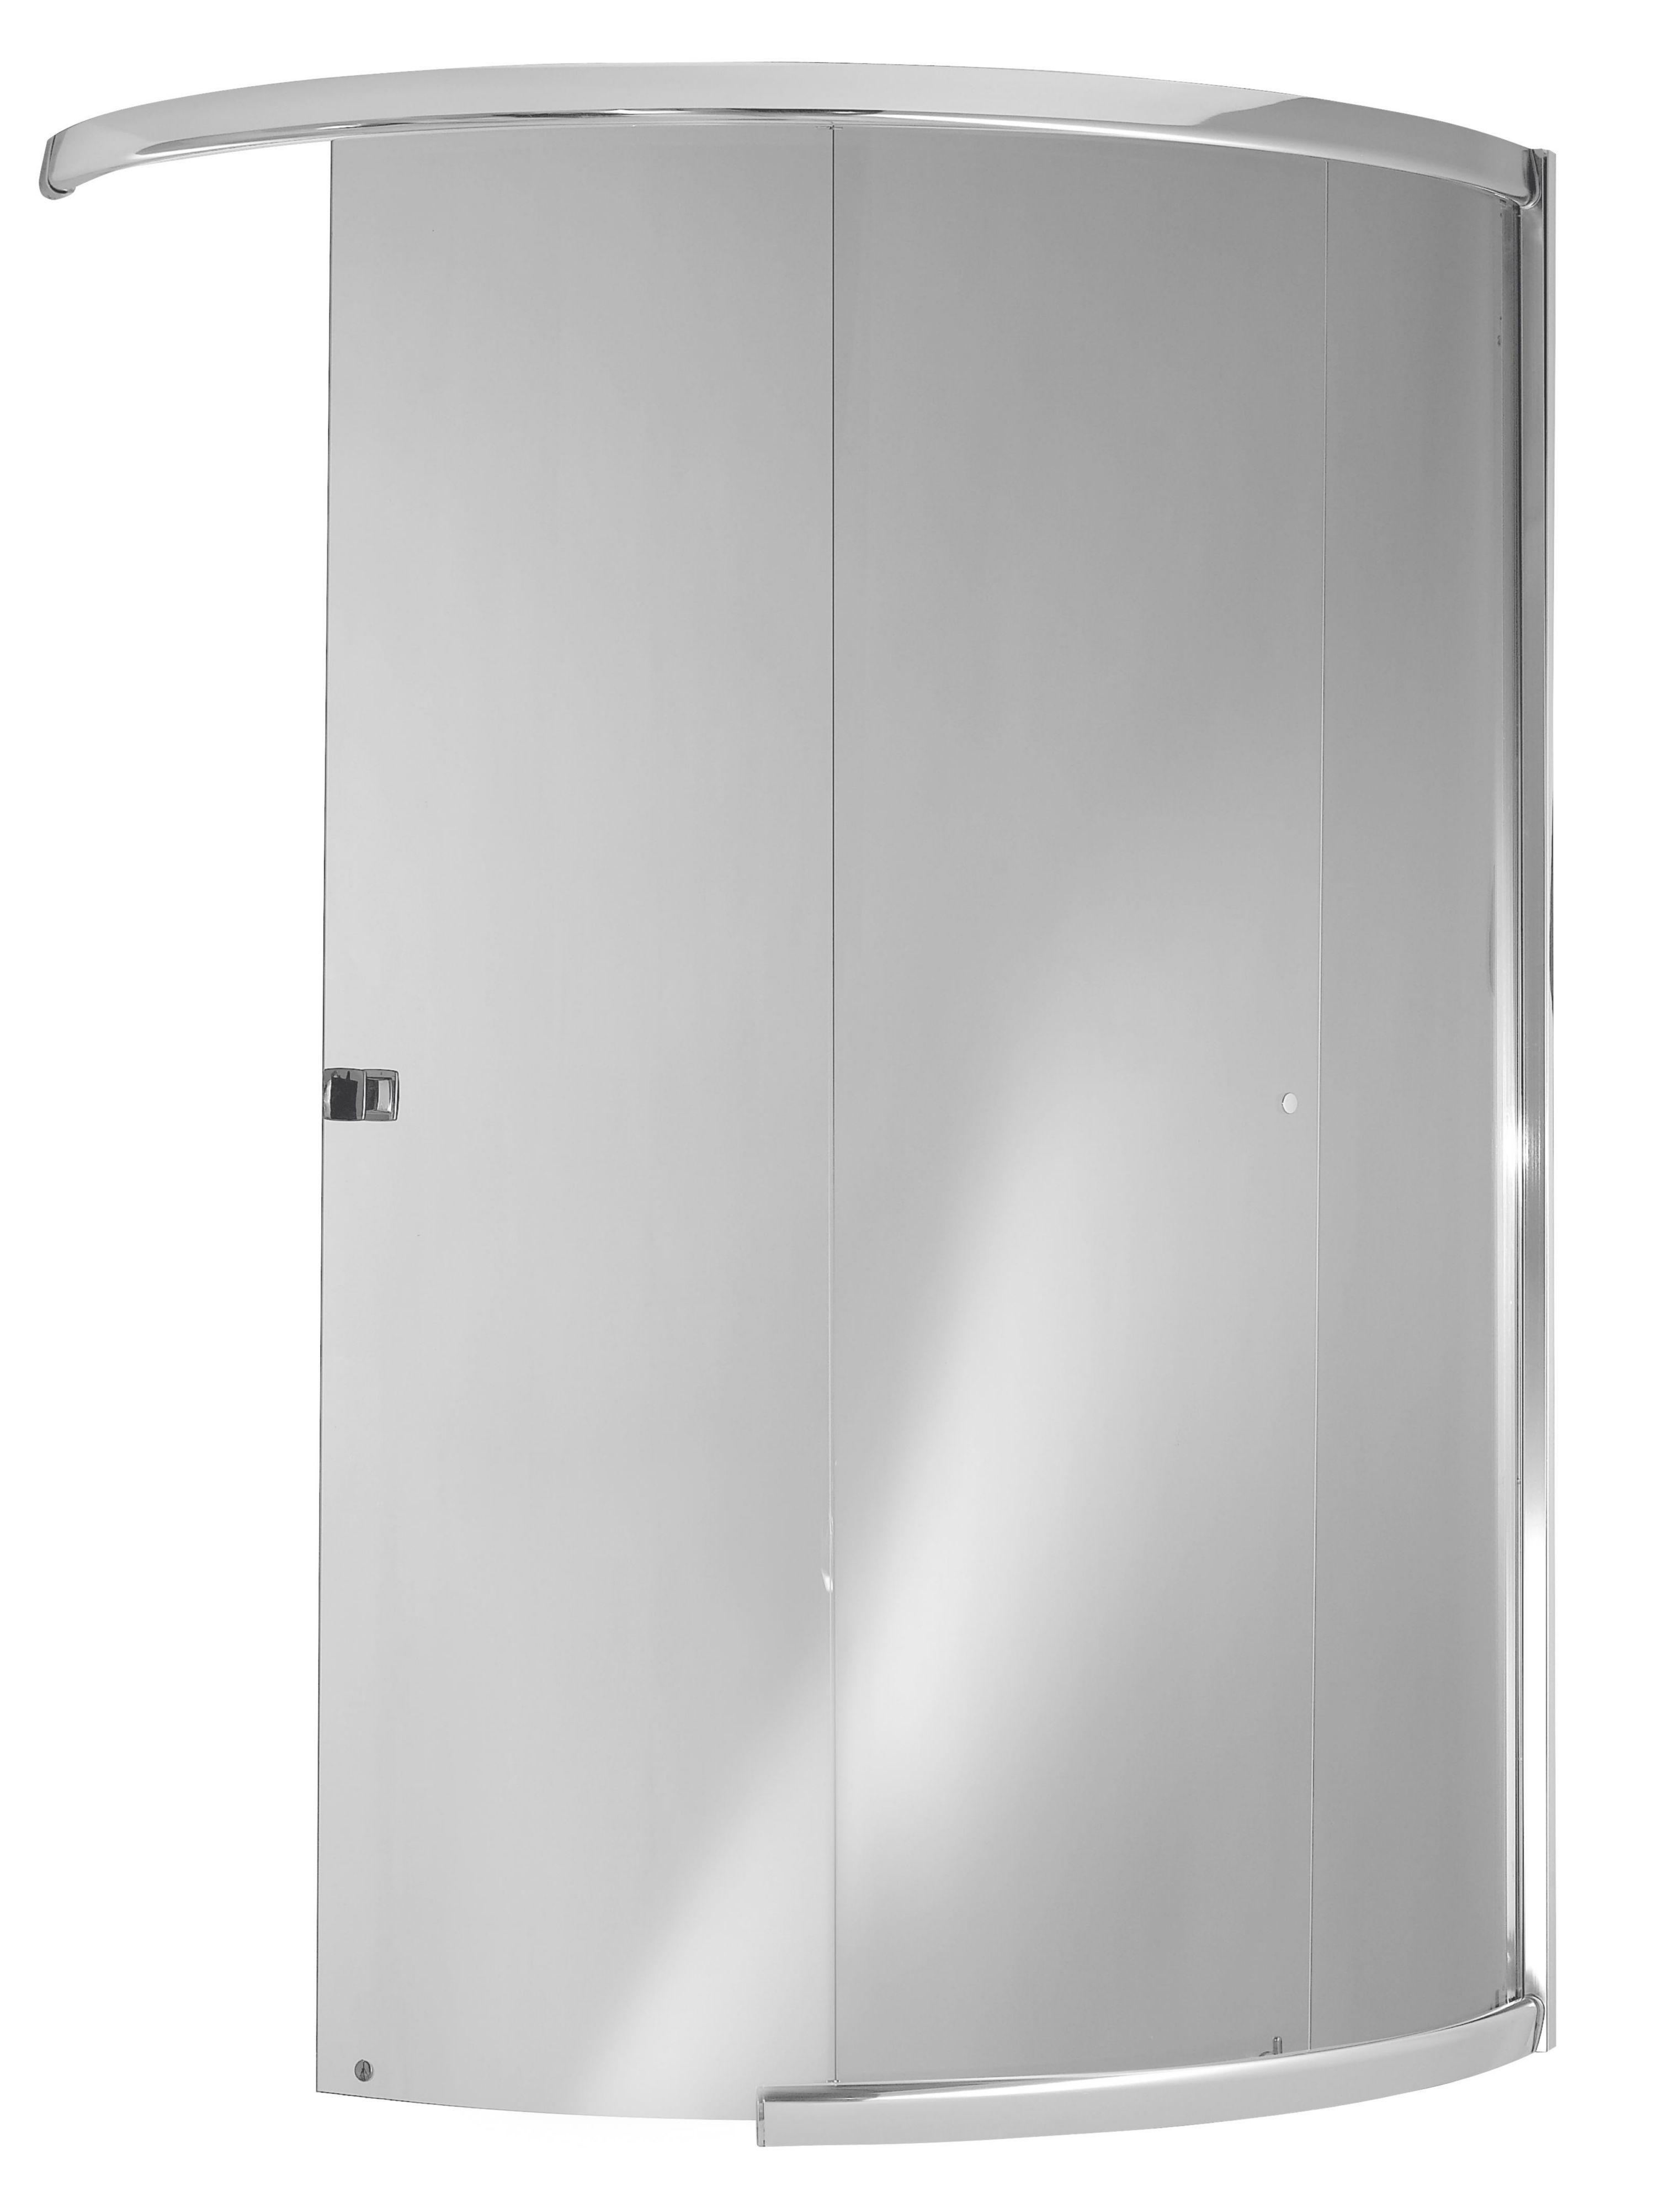 Curved Shower Screen Perfect Veebath Essentials Bath D